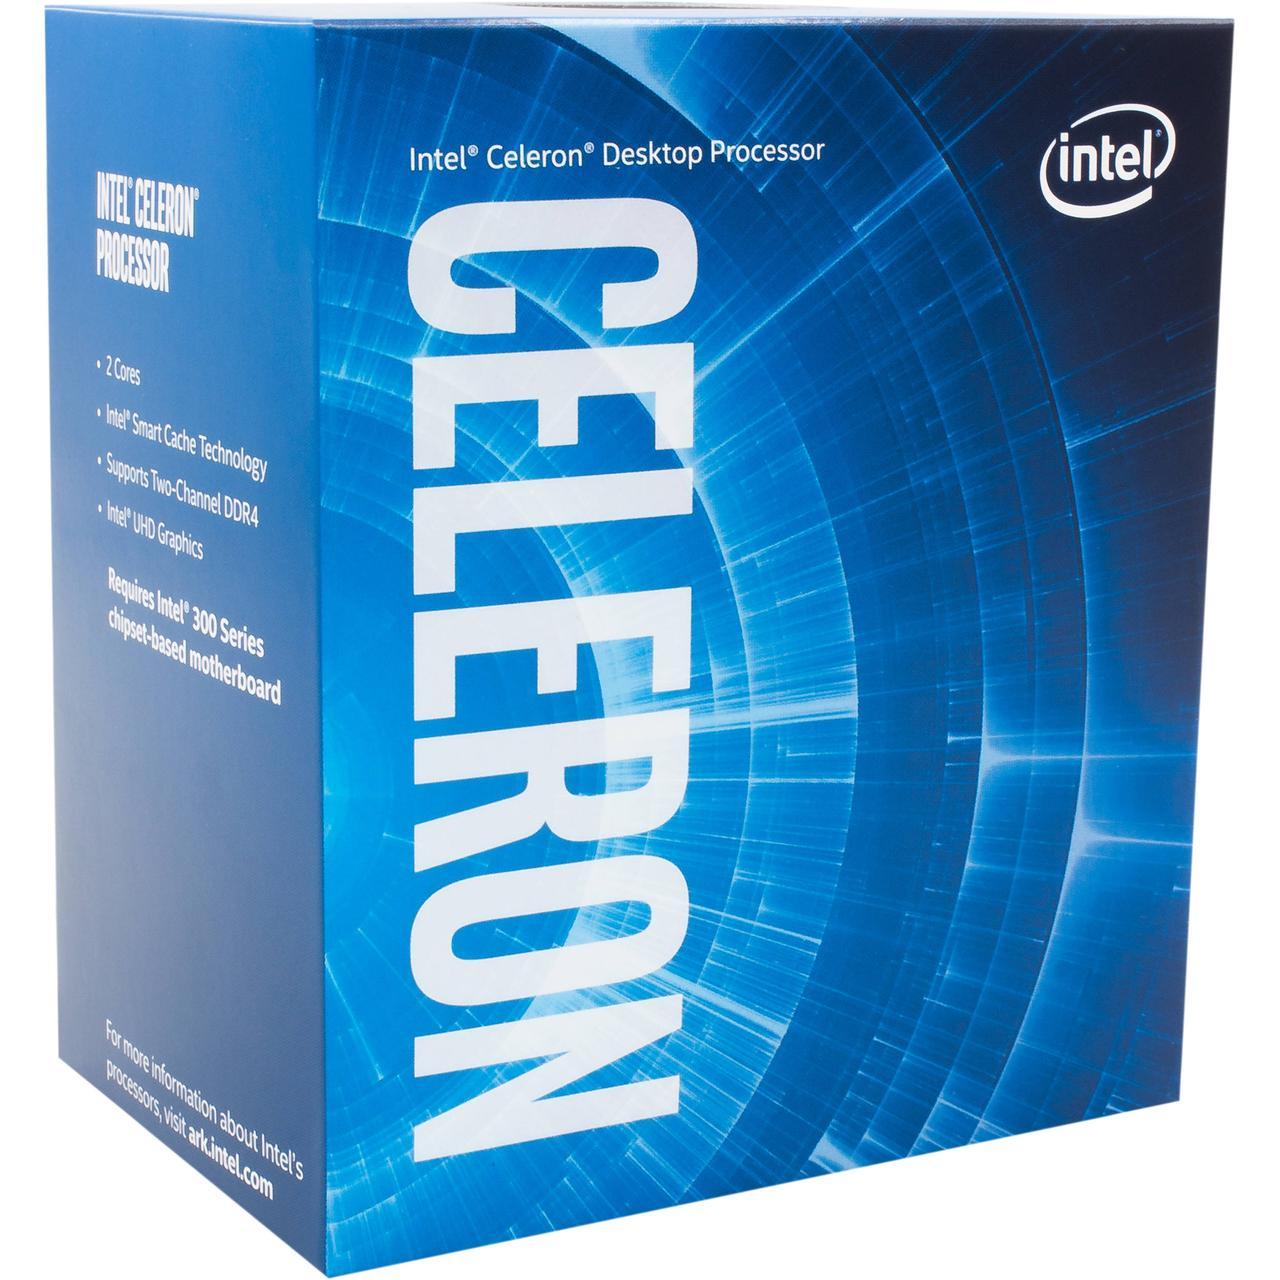 Процессор Intel Celeron G4900 3.1GHz (BX80684G4900) s1151, BOX